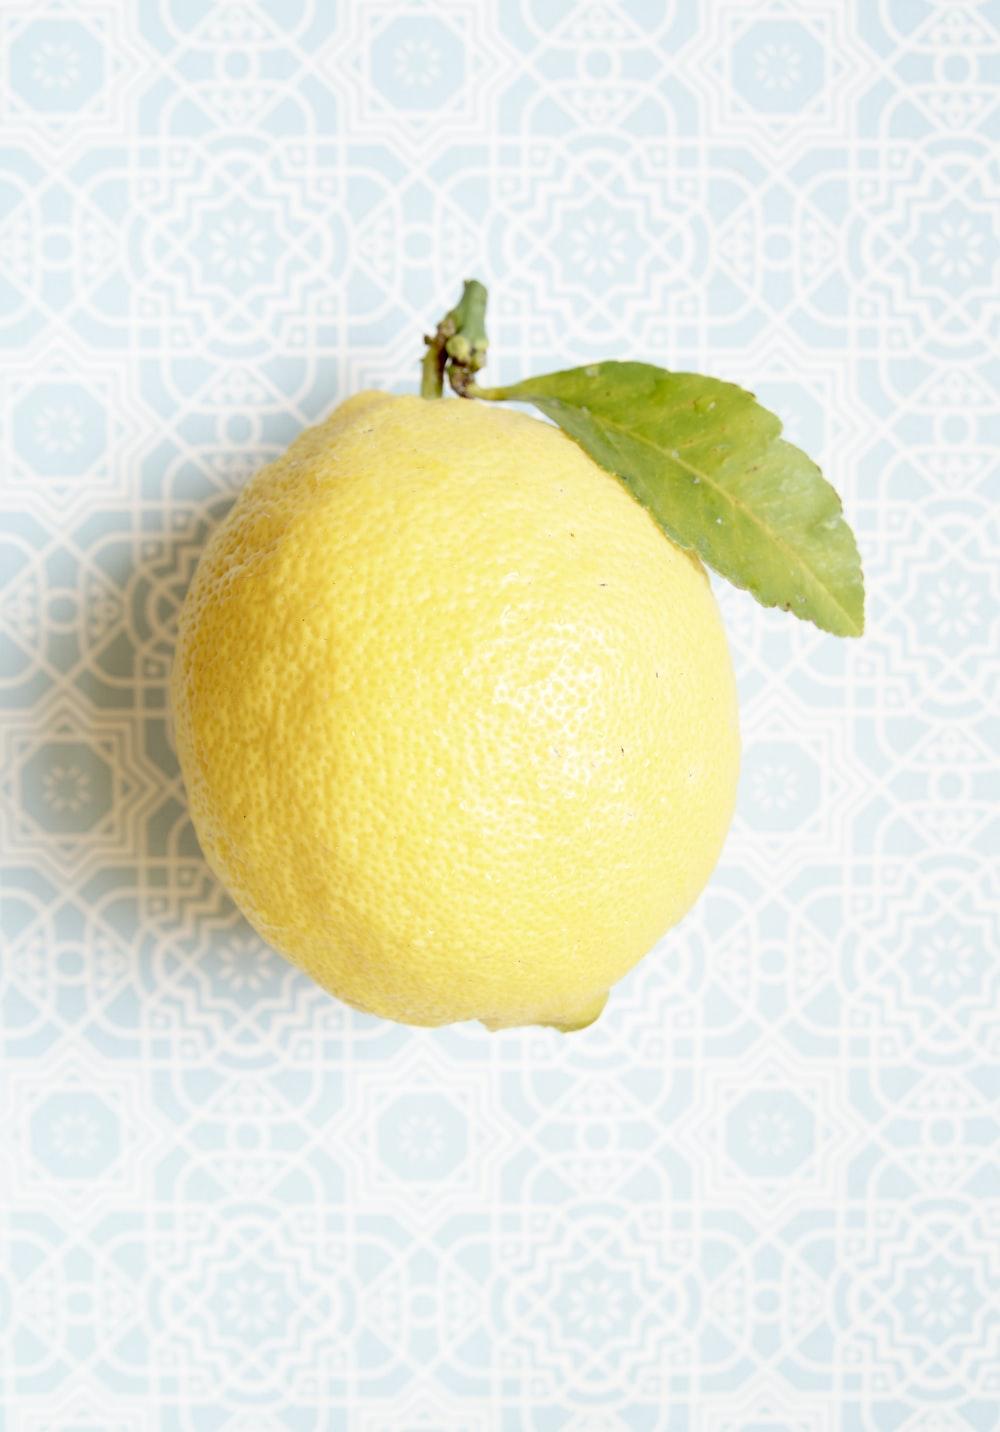 yellow lemon fruit on white and blue textile